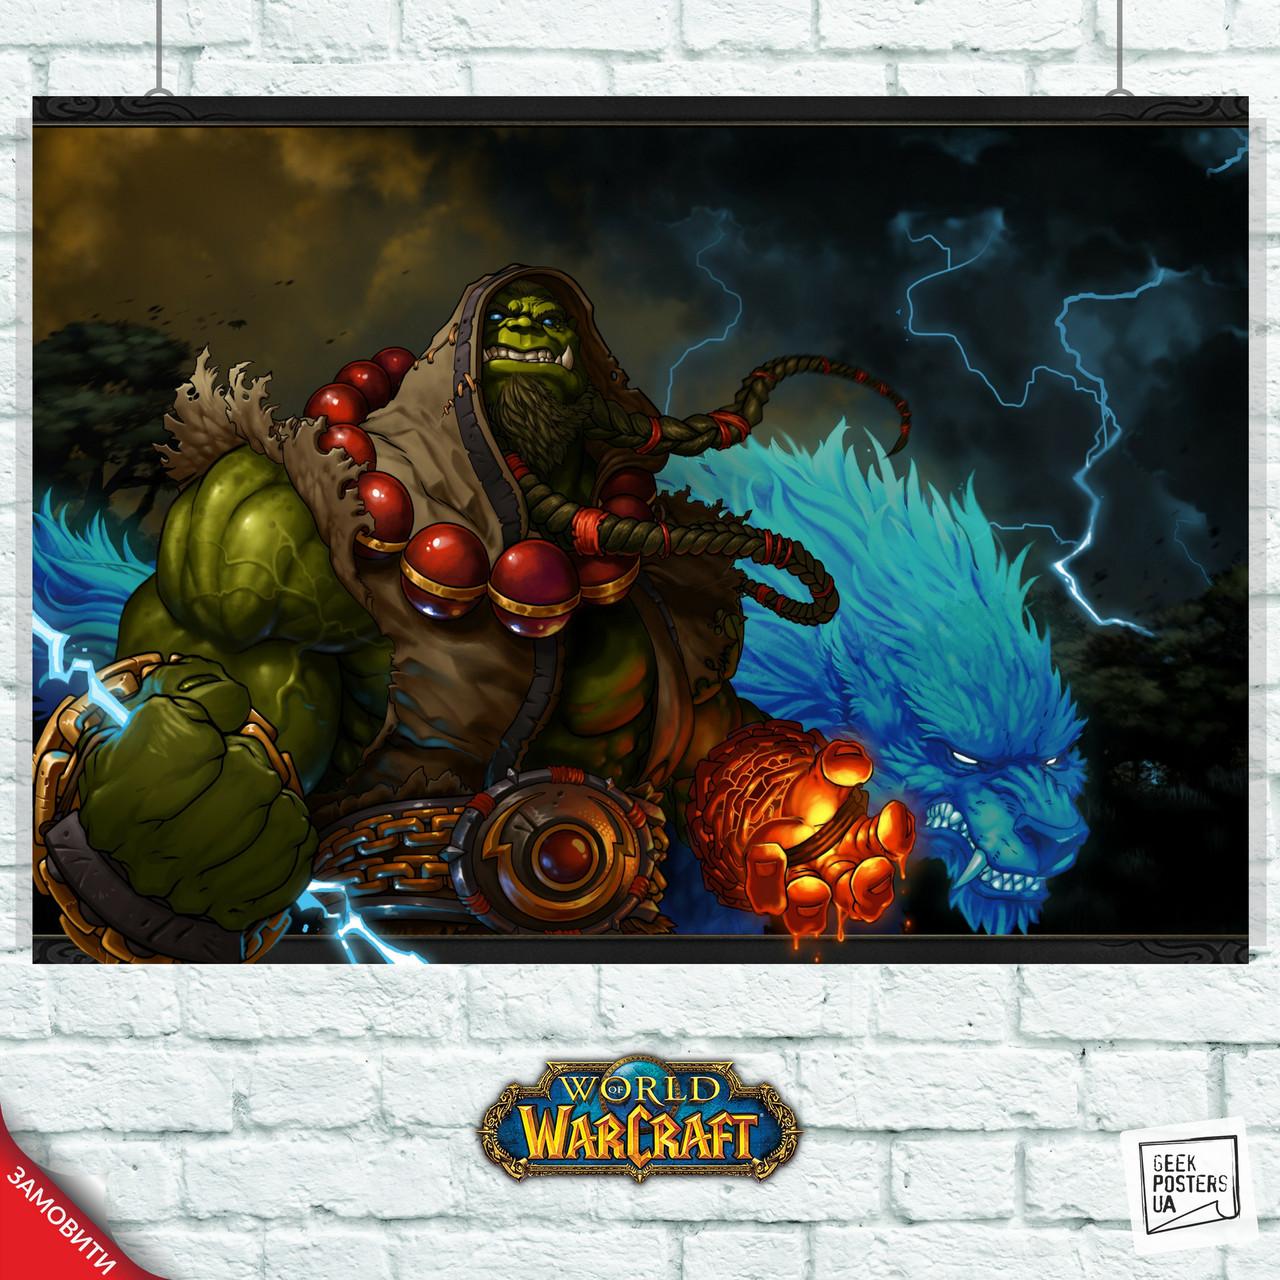 Постер Шаман, Тралл, World of Warcraft. Размер 60x43см (A2). Глянцевая бумага